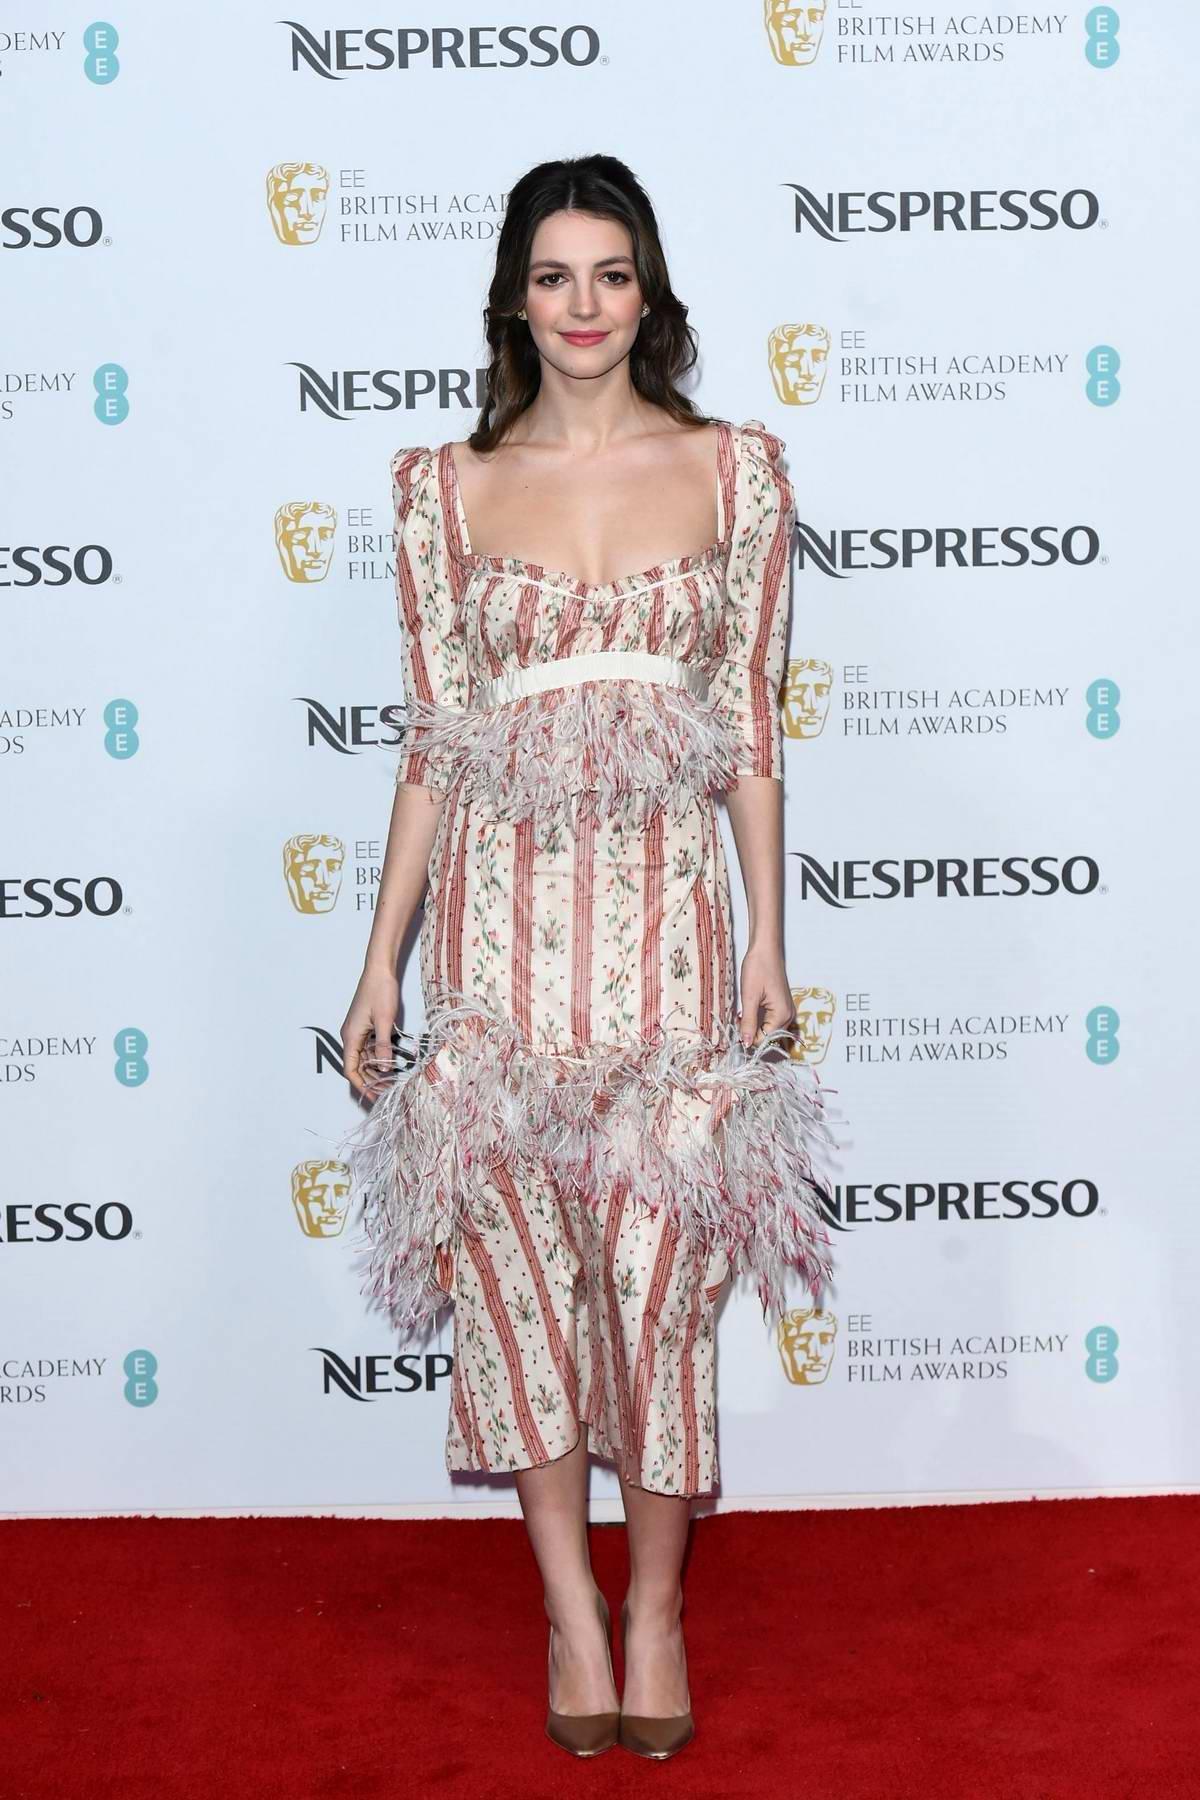 Ella Hunt attends the BAFTA Nespresso Nominees Party in London, UK